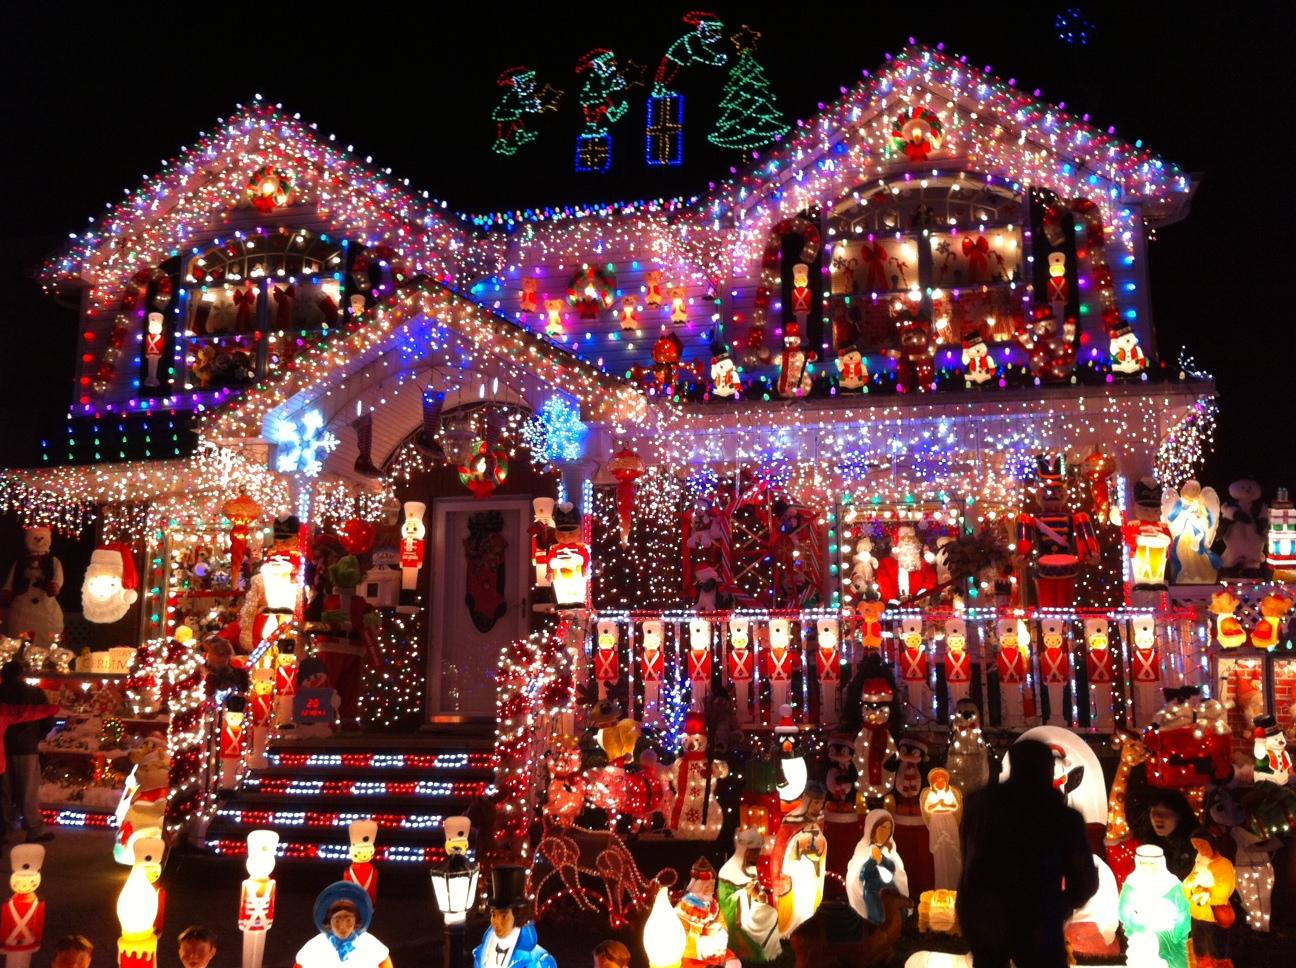 Christmas window lights decorations - Edward